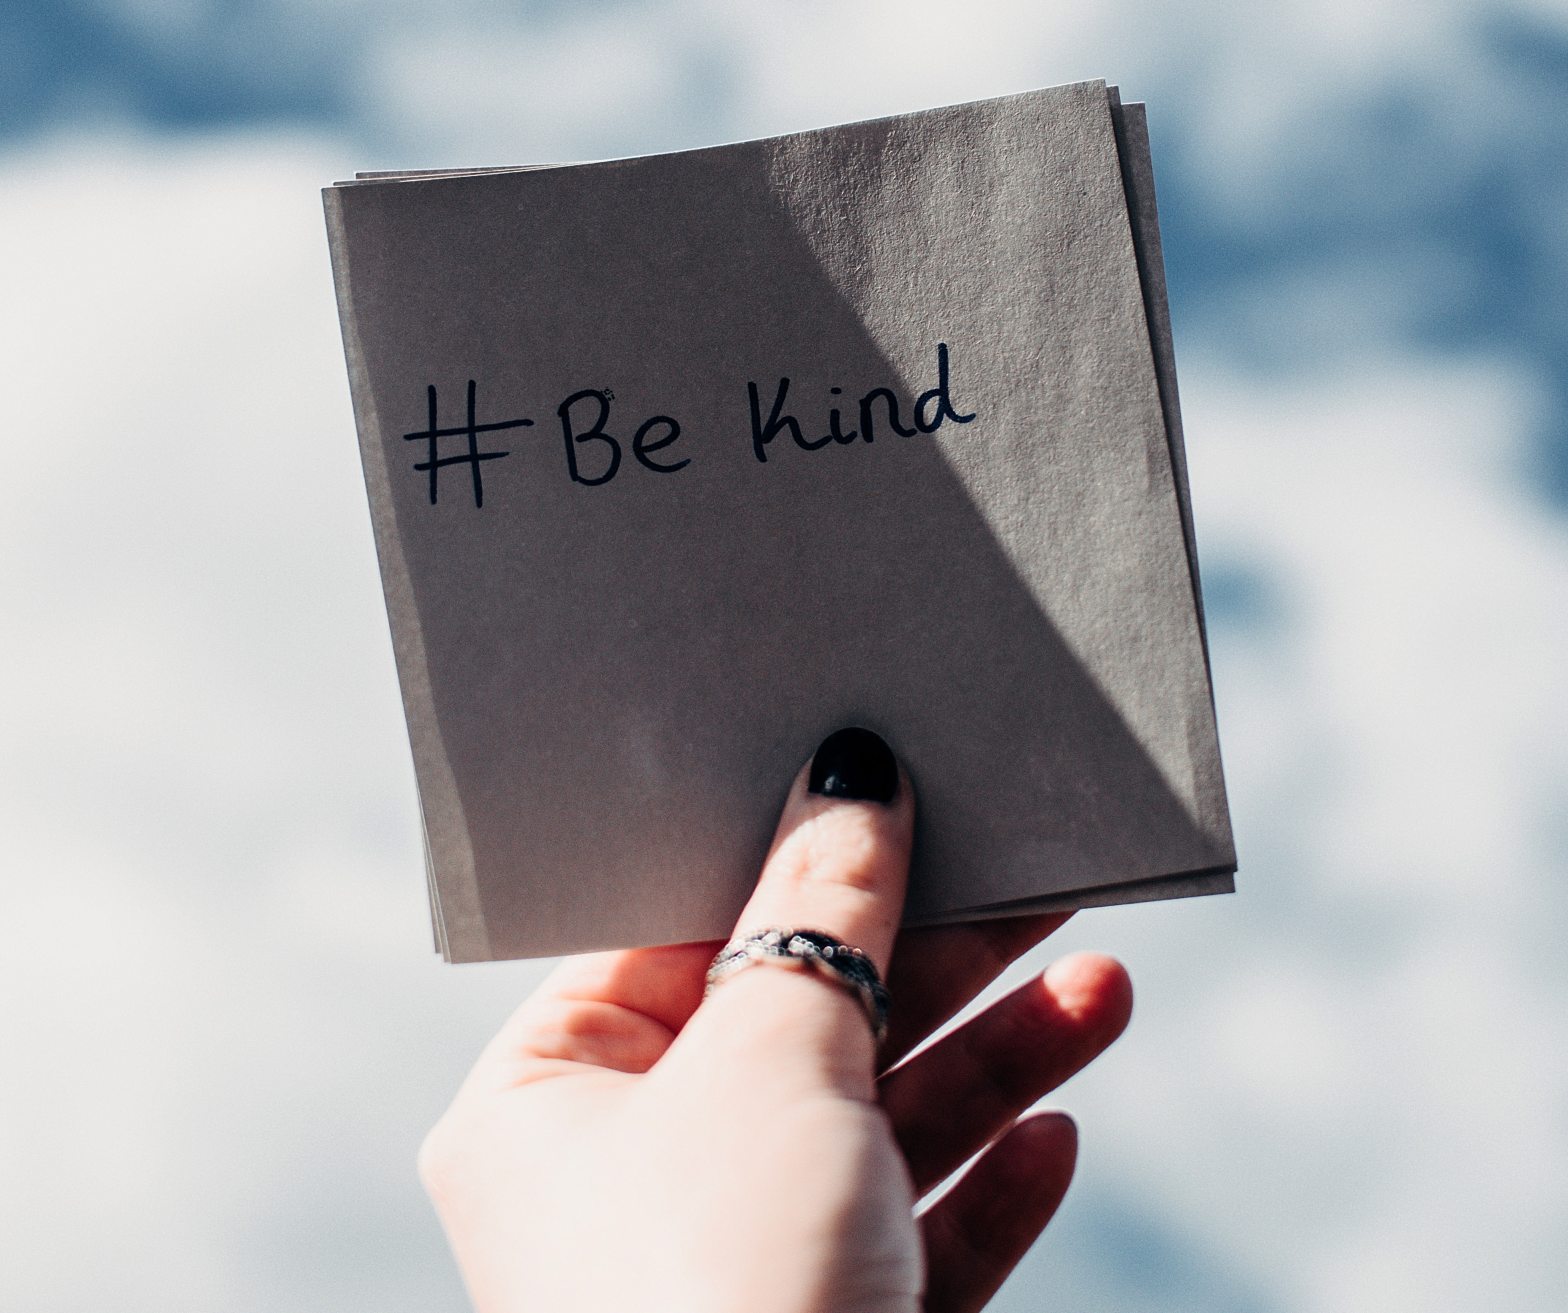 Hand holding #BeKind message